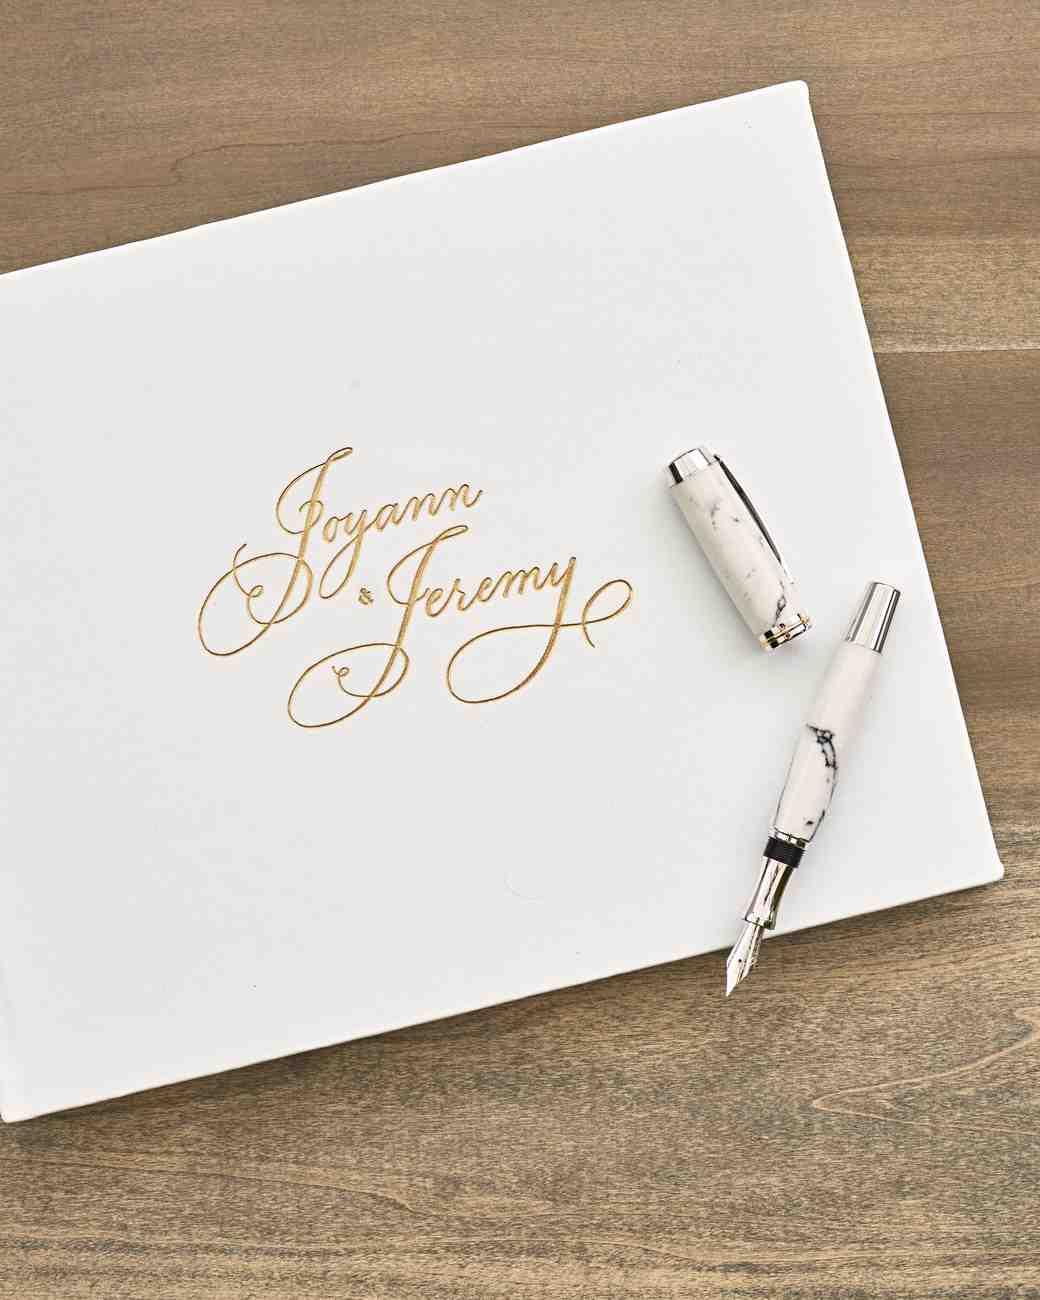 joyann jeremy wedding guest book